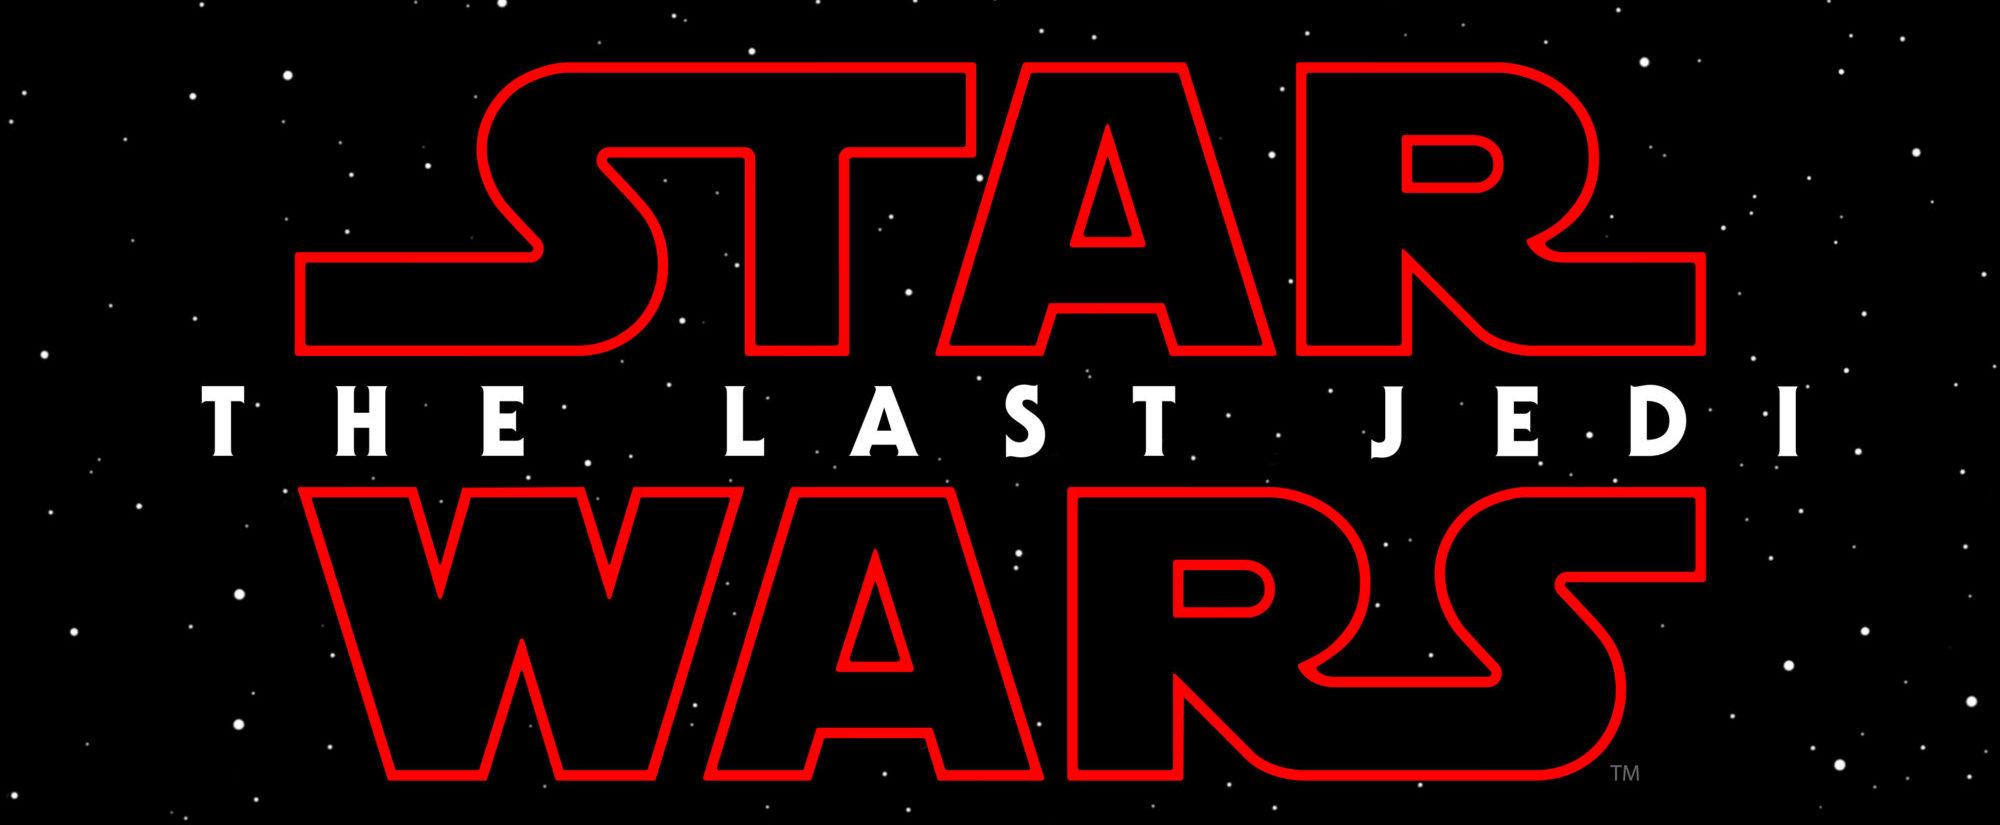 Most Haunting Image in 'Star Wars: The Last Jedi'